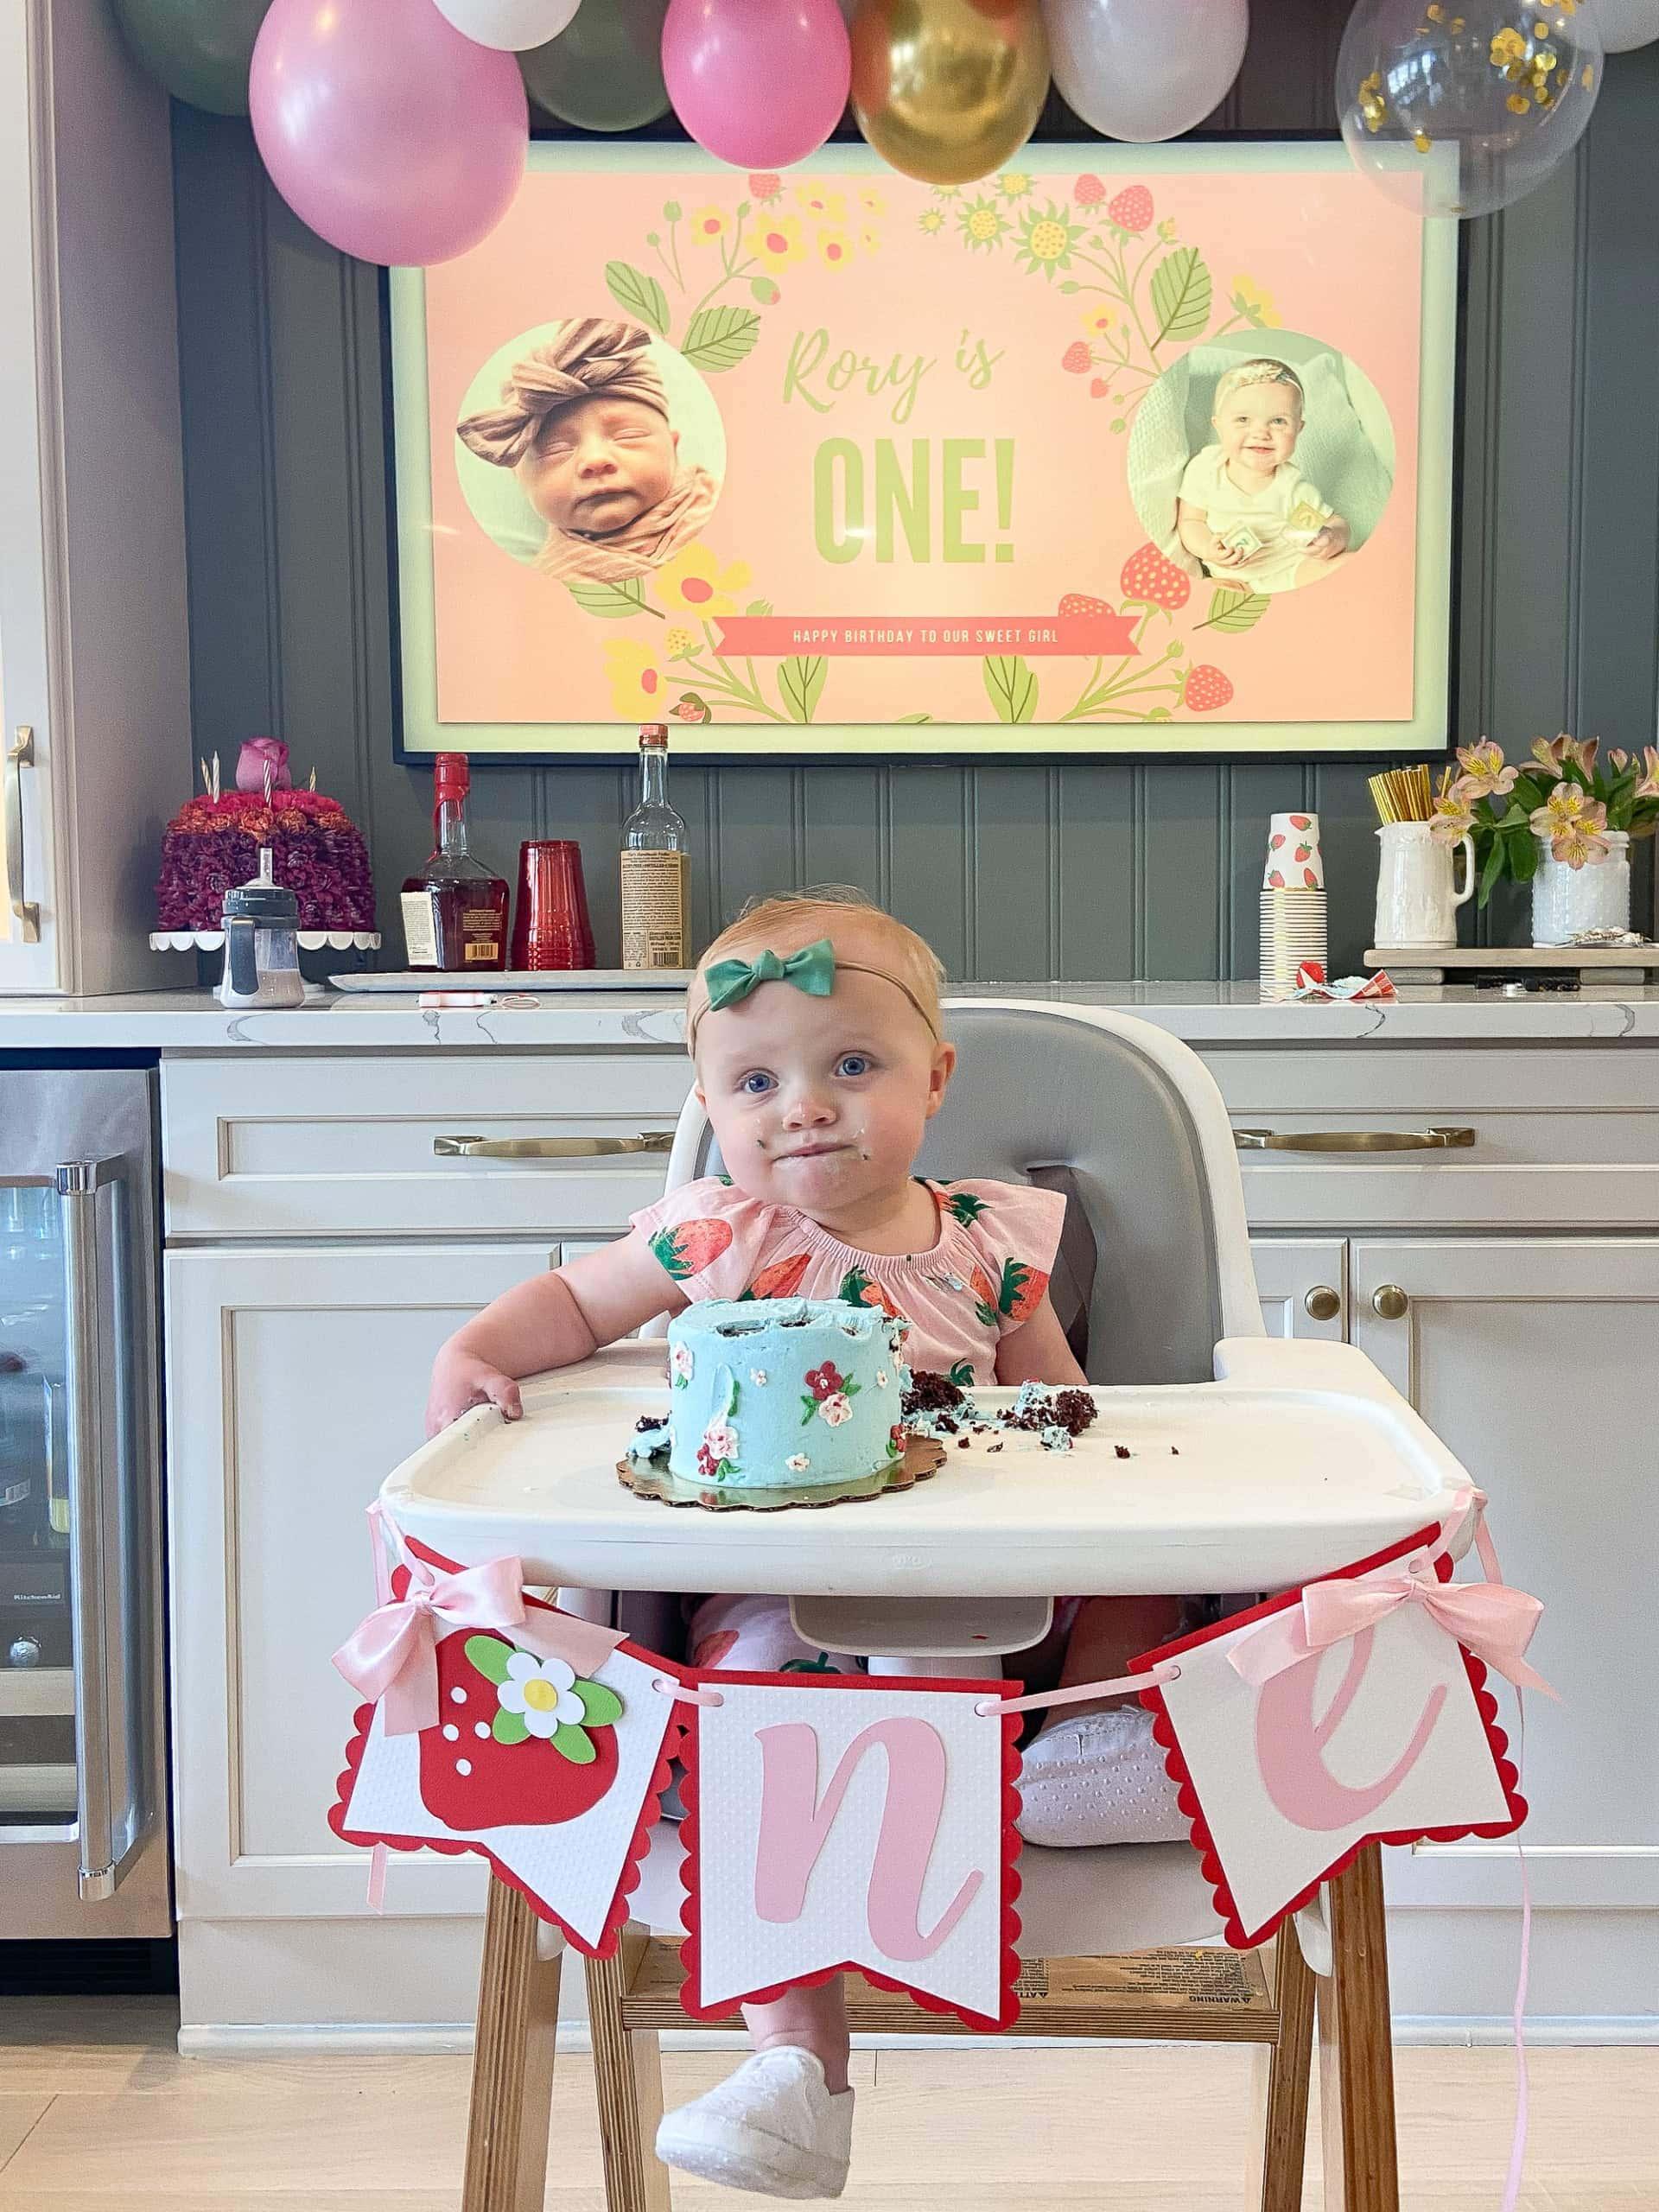 Rory eating her smash cake